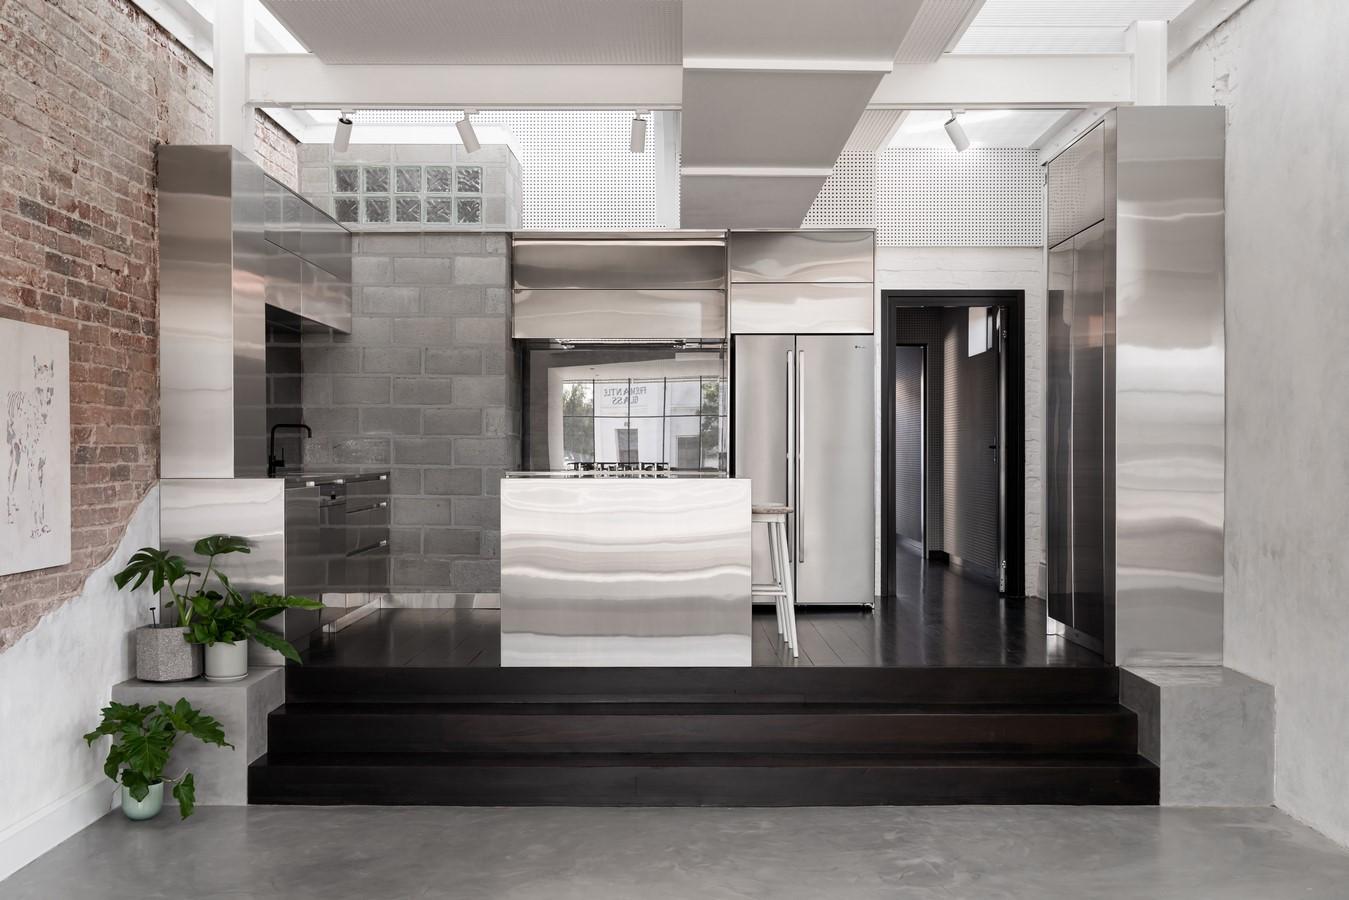 South Terrace Mezzanine House By Philip Stejskal Architecture - Sheet2